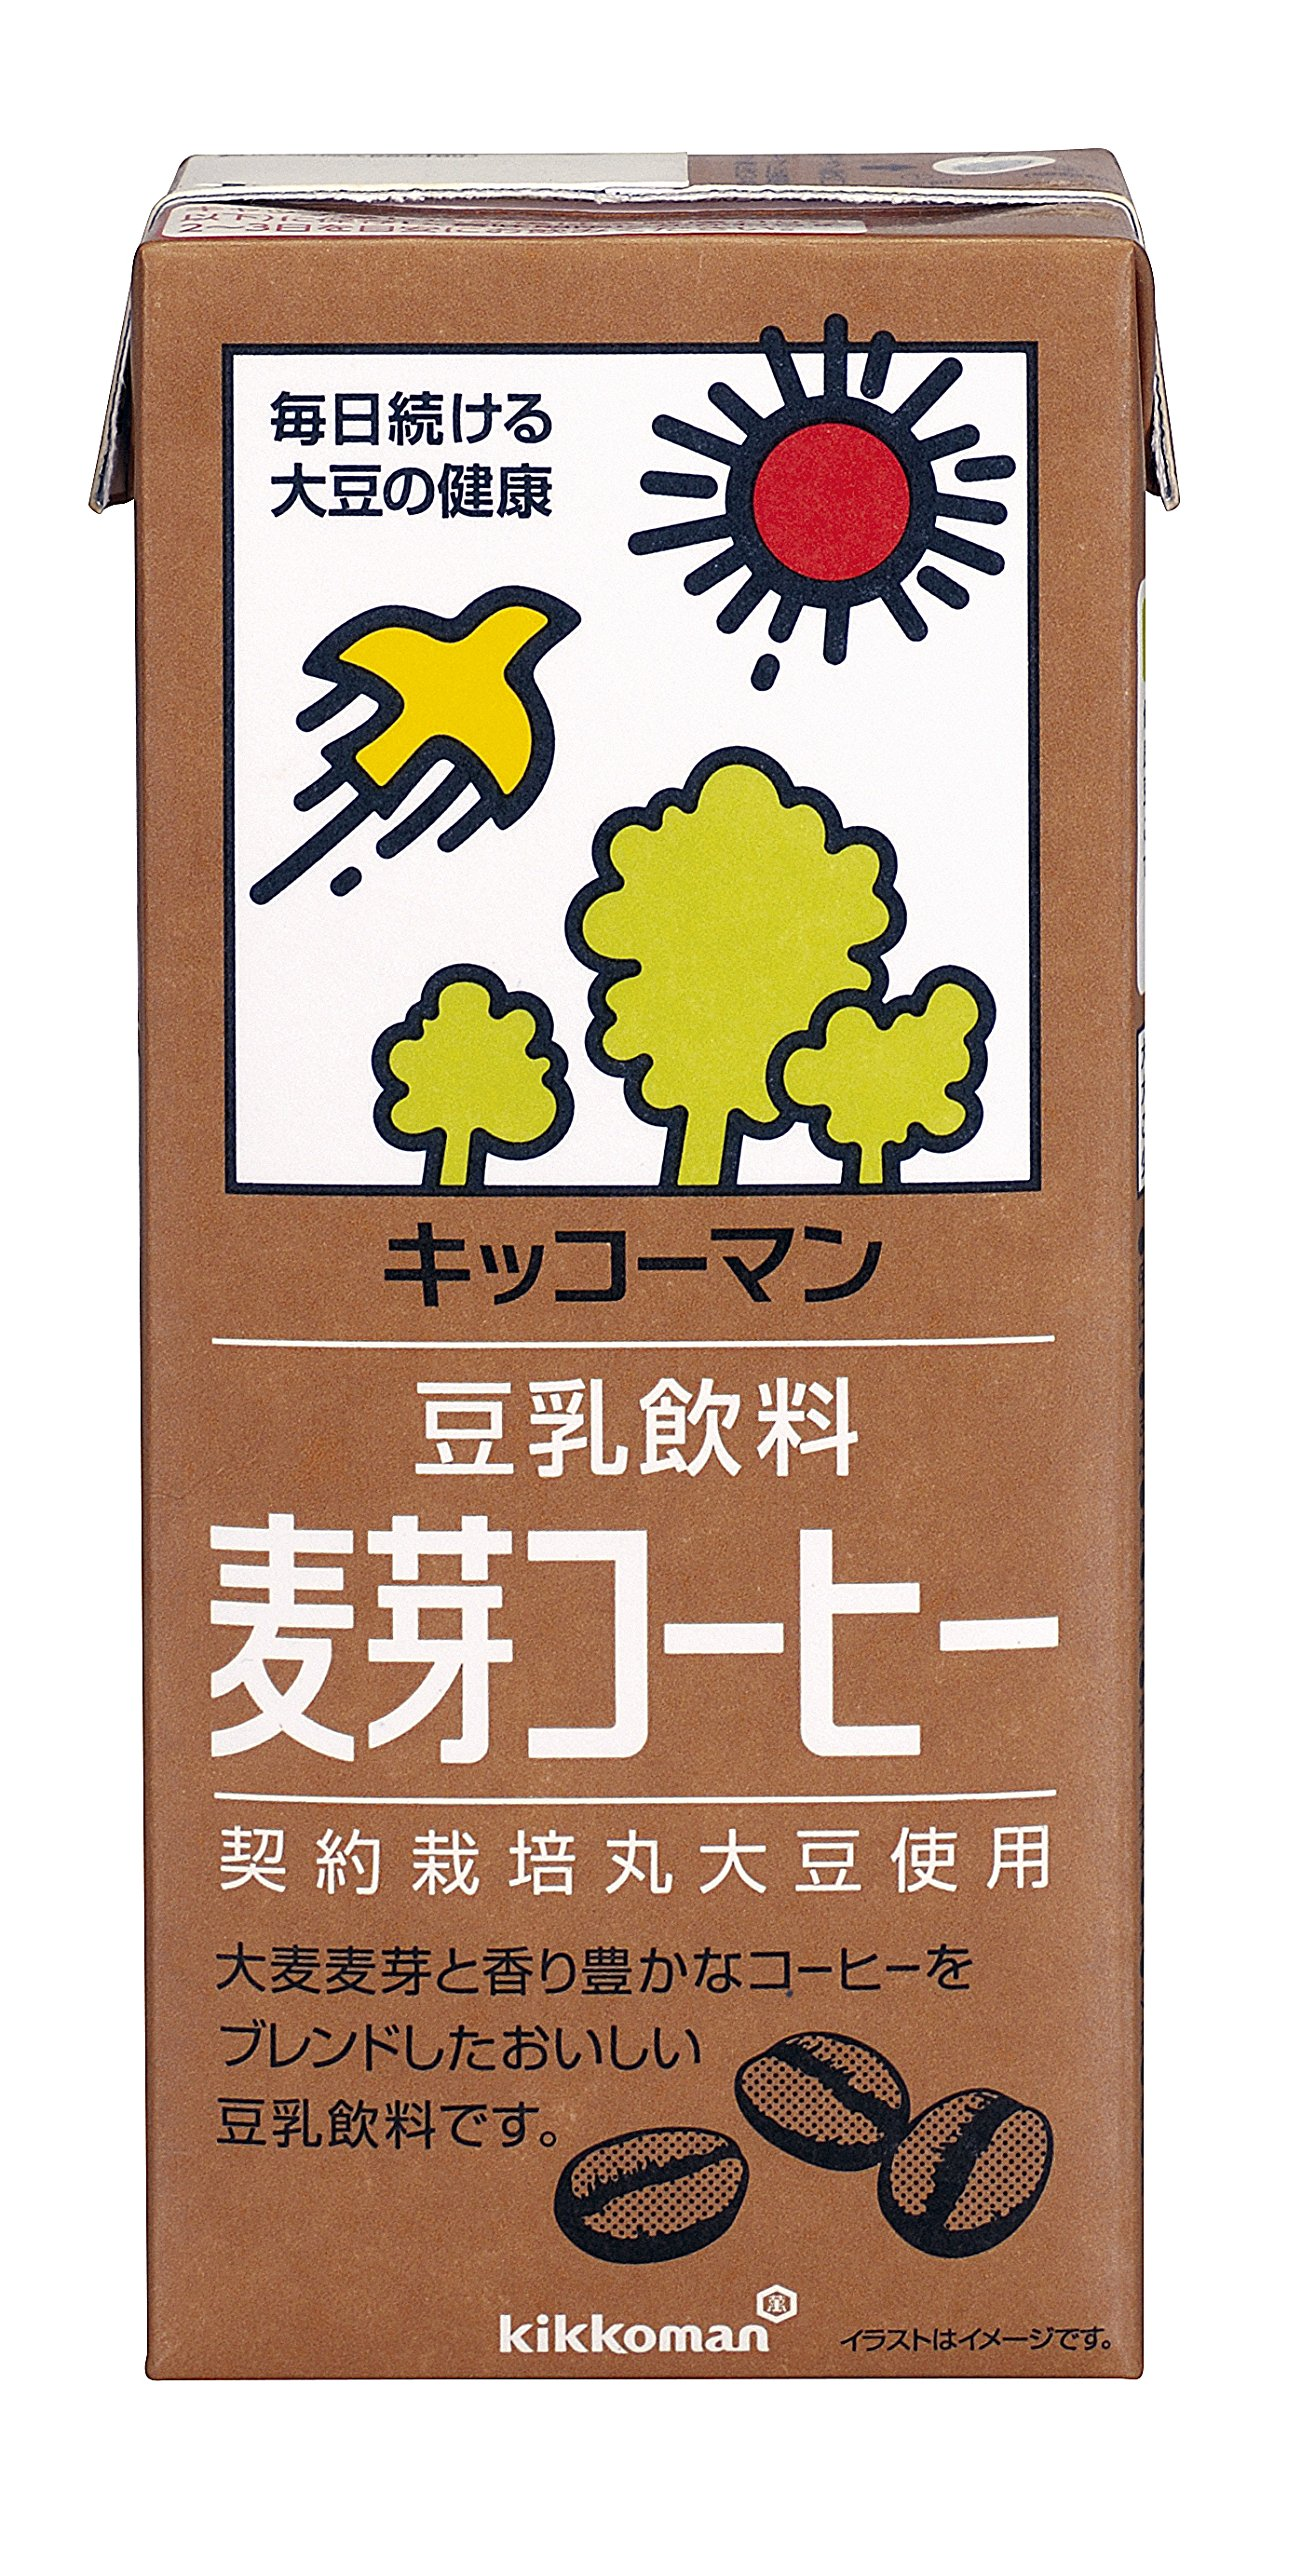 Kibun soy milk drink malt coffee 1LX6 this